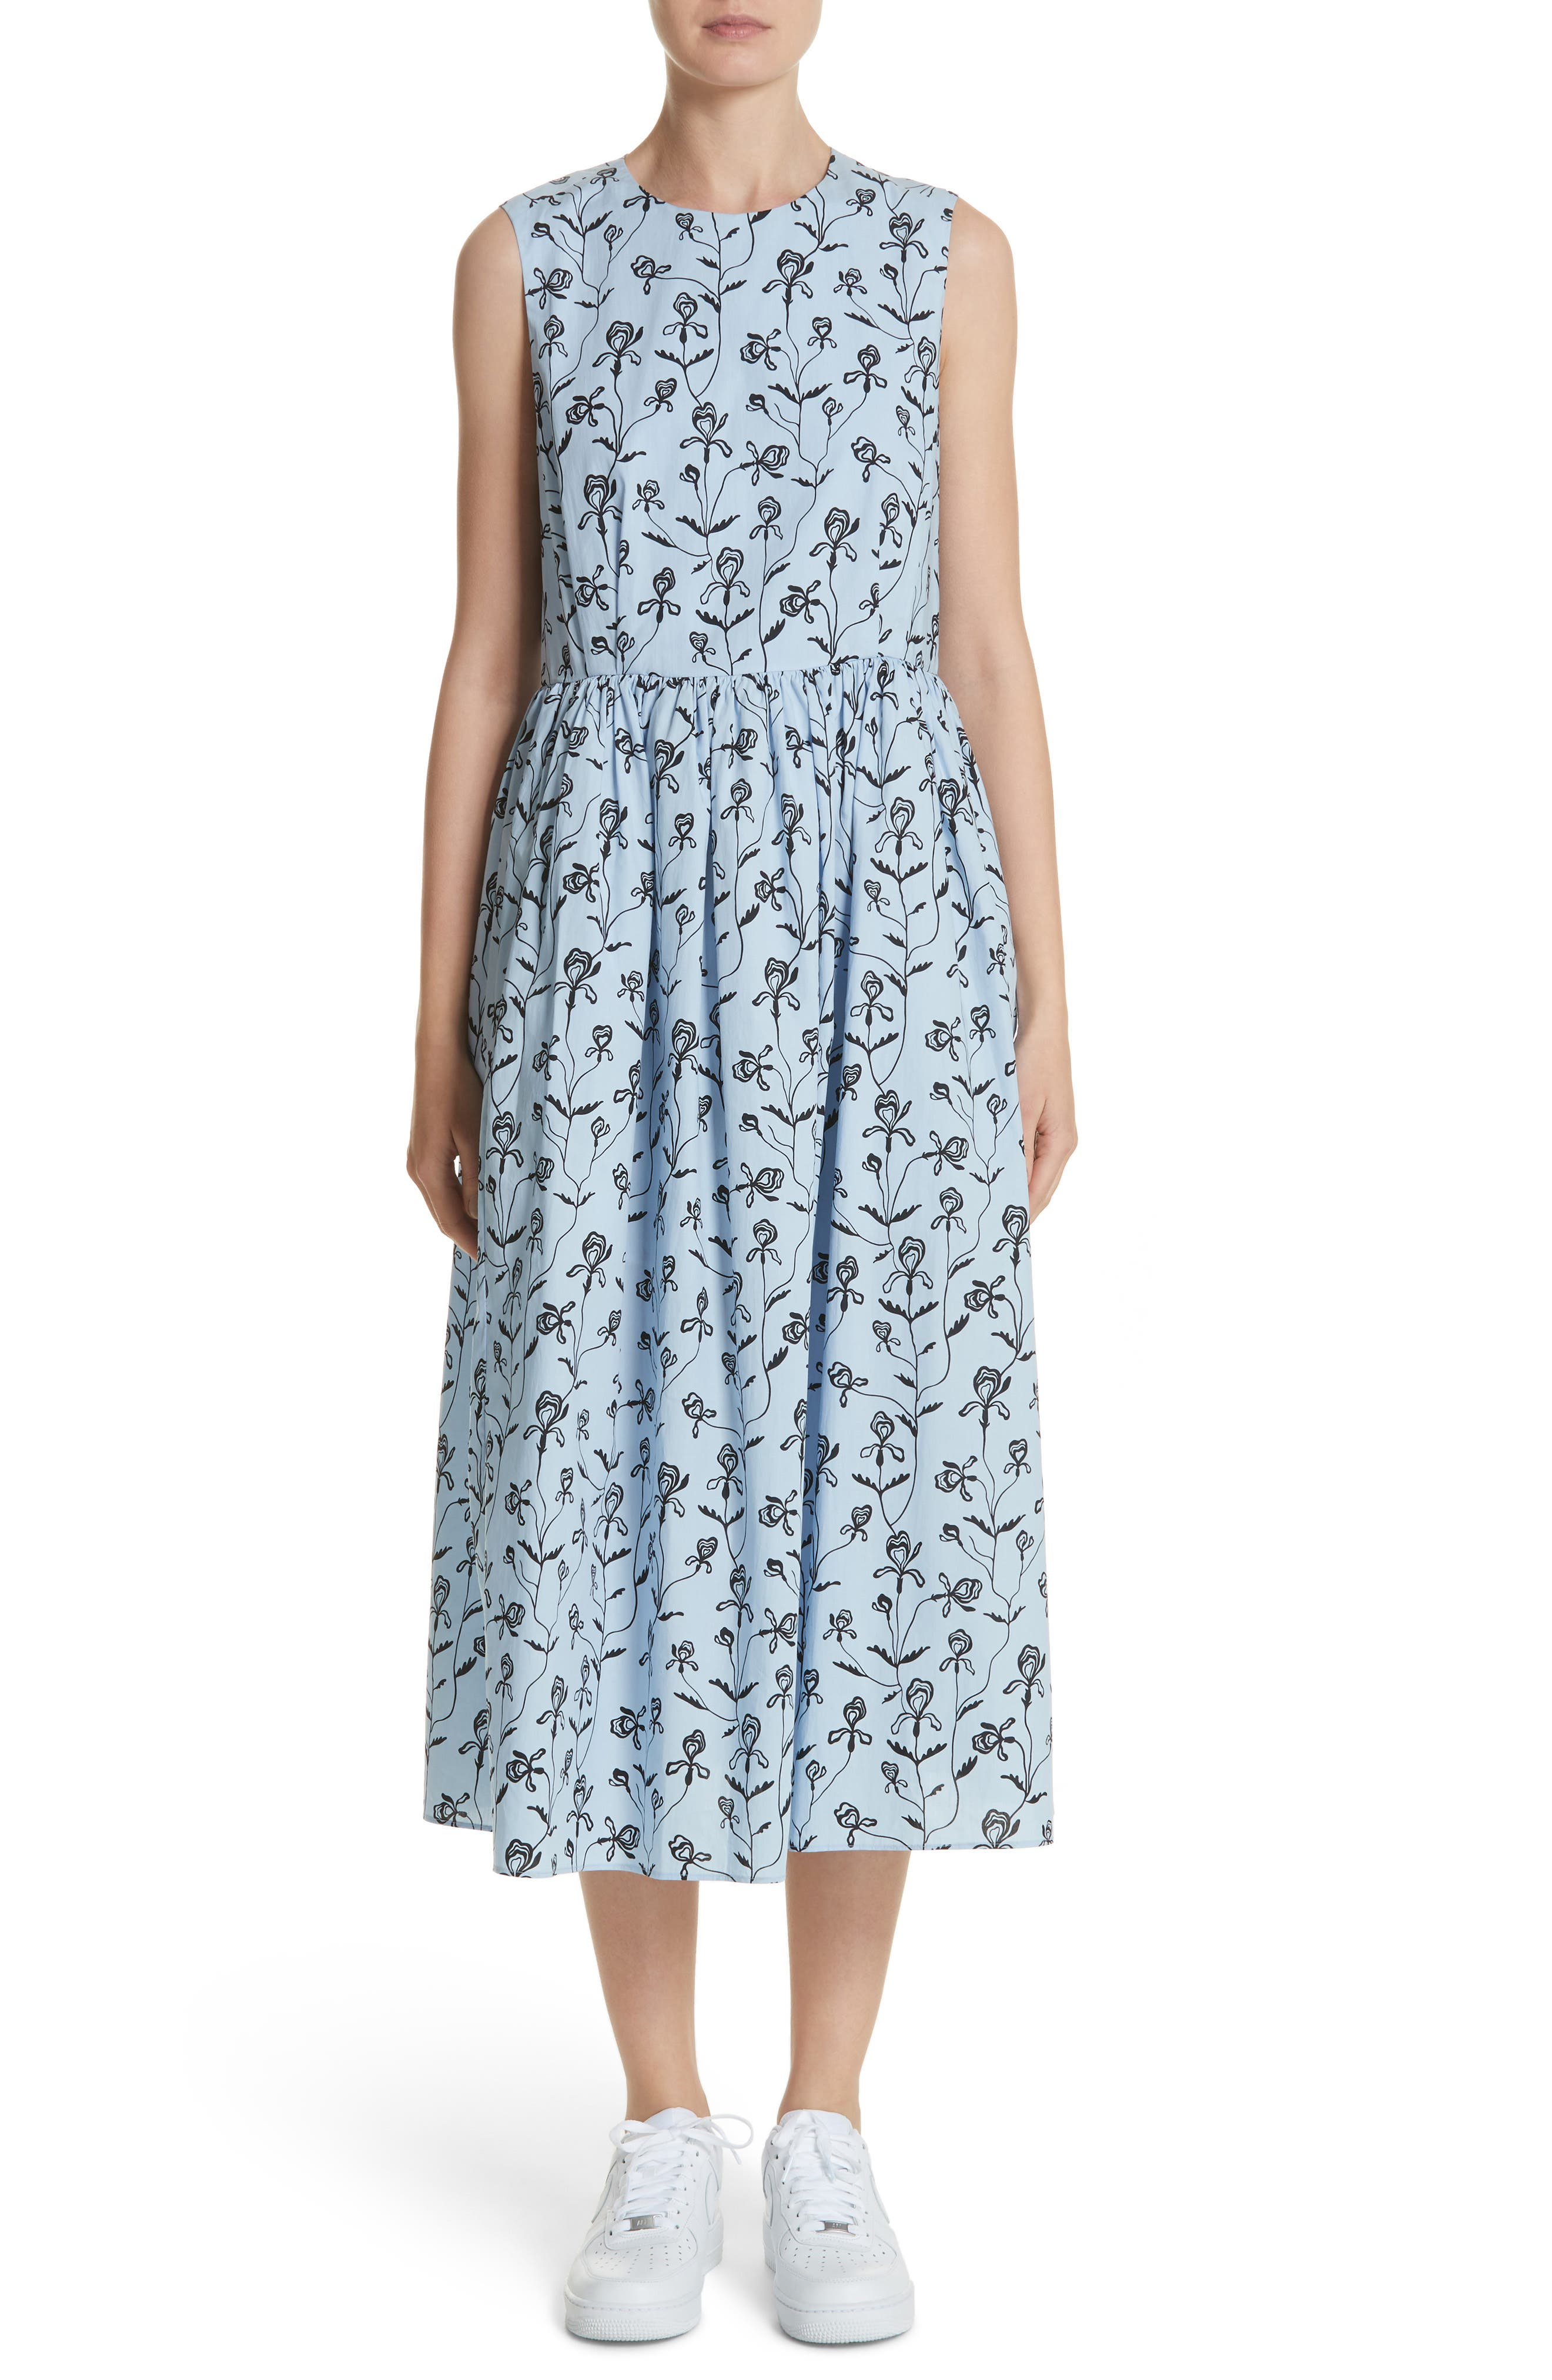 Alternate Image 1 Selected - Sofie D'Hoore Floral Print Sleeveless Dress